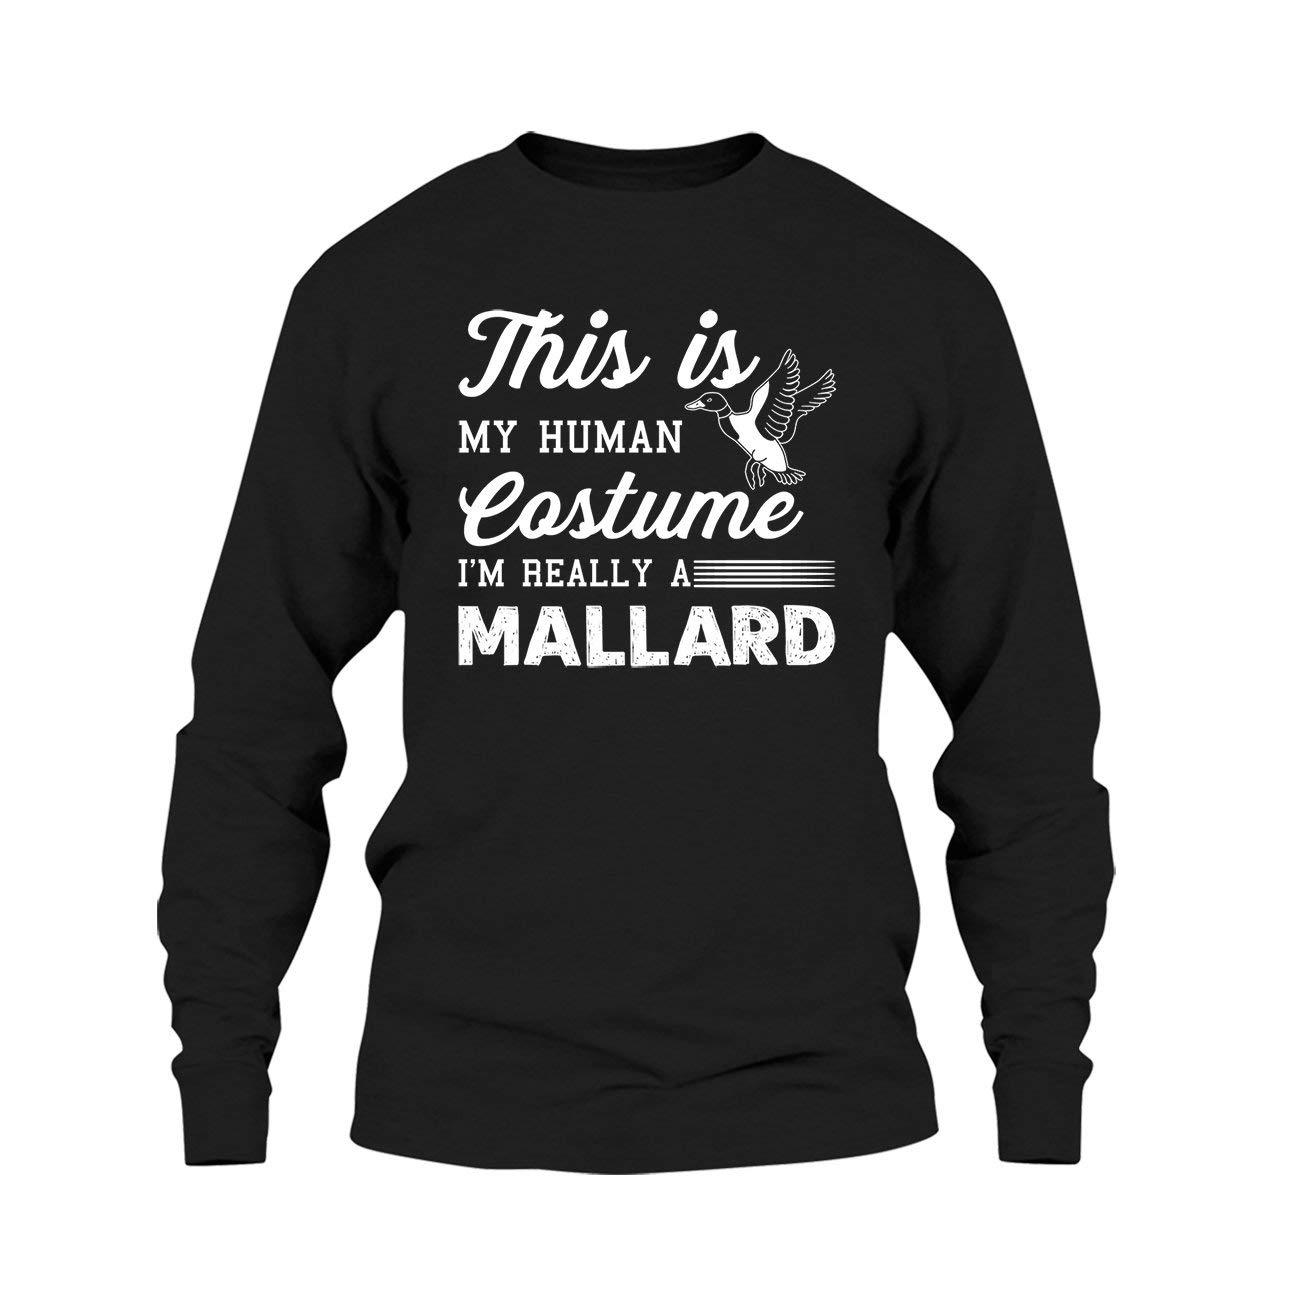 Im Really A Mallard Shirt Clothing Tee Shirt